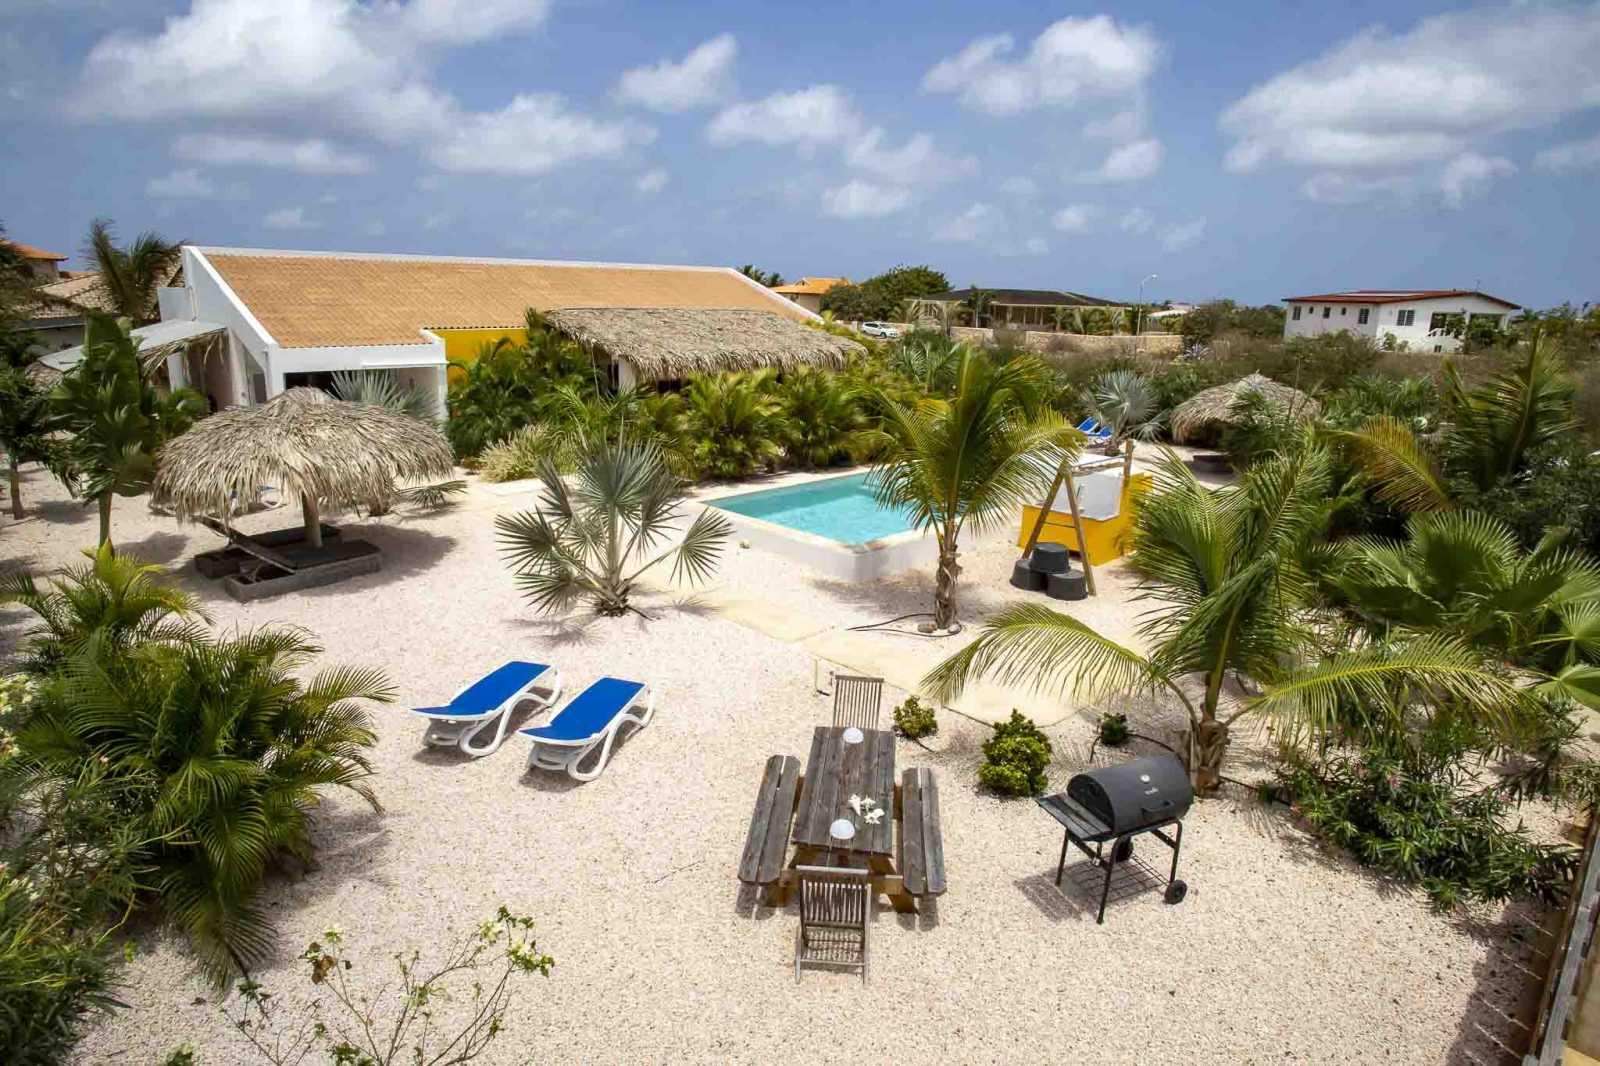 Luxury Villa Apartments for rent Bonaire - Kas Tuna